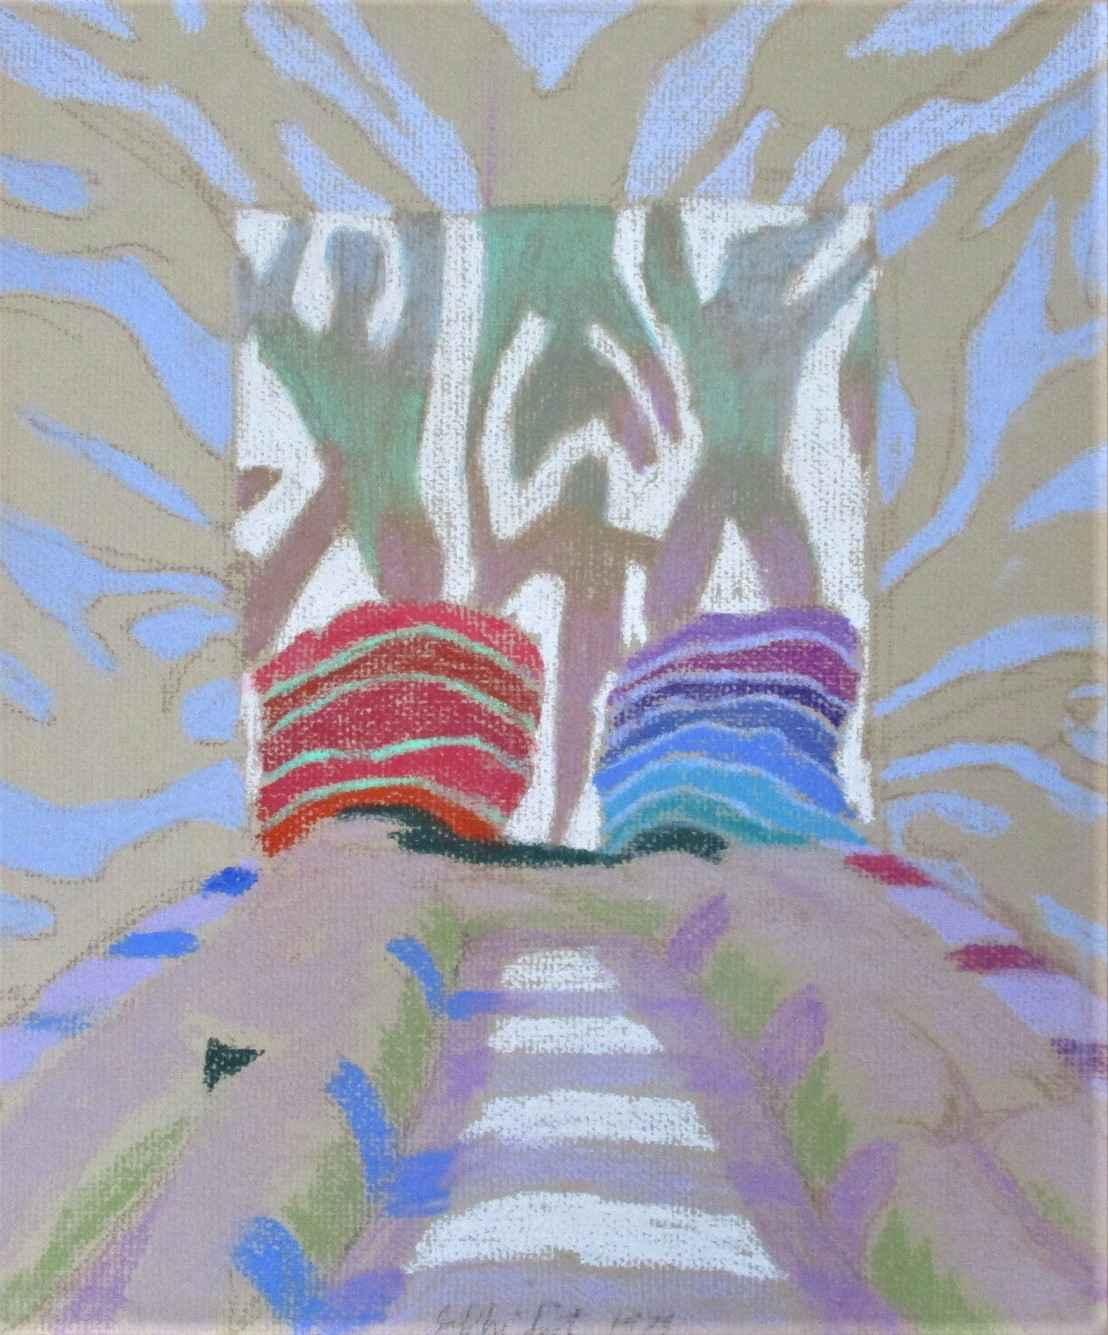 White Light by  Jack McLarty - Masterpiece Online